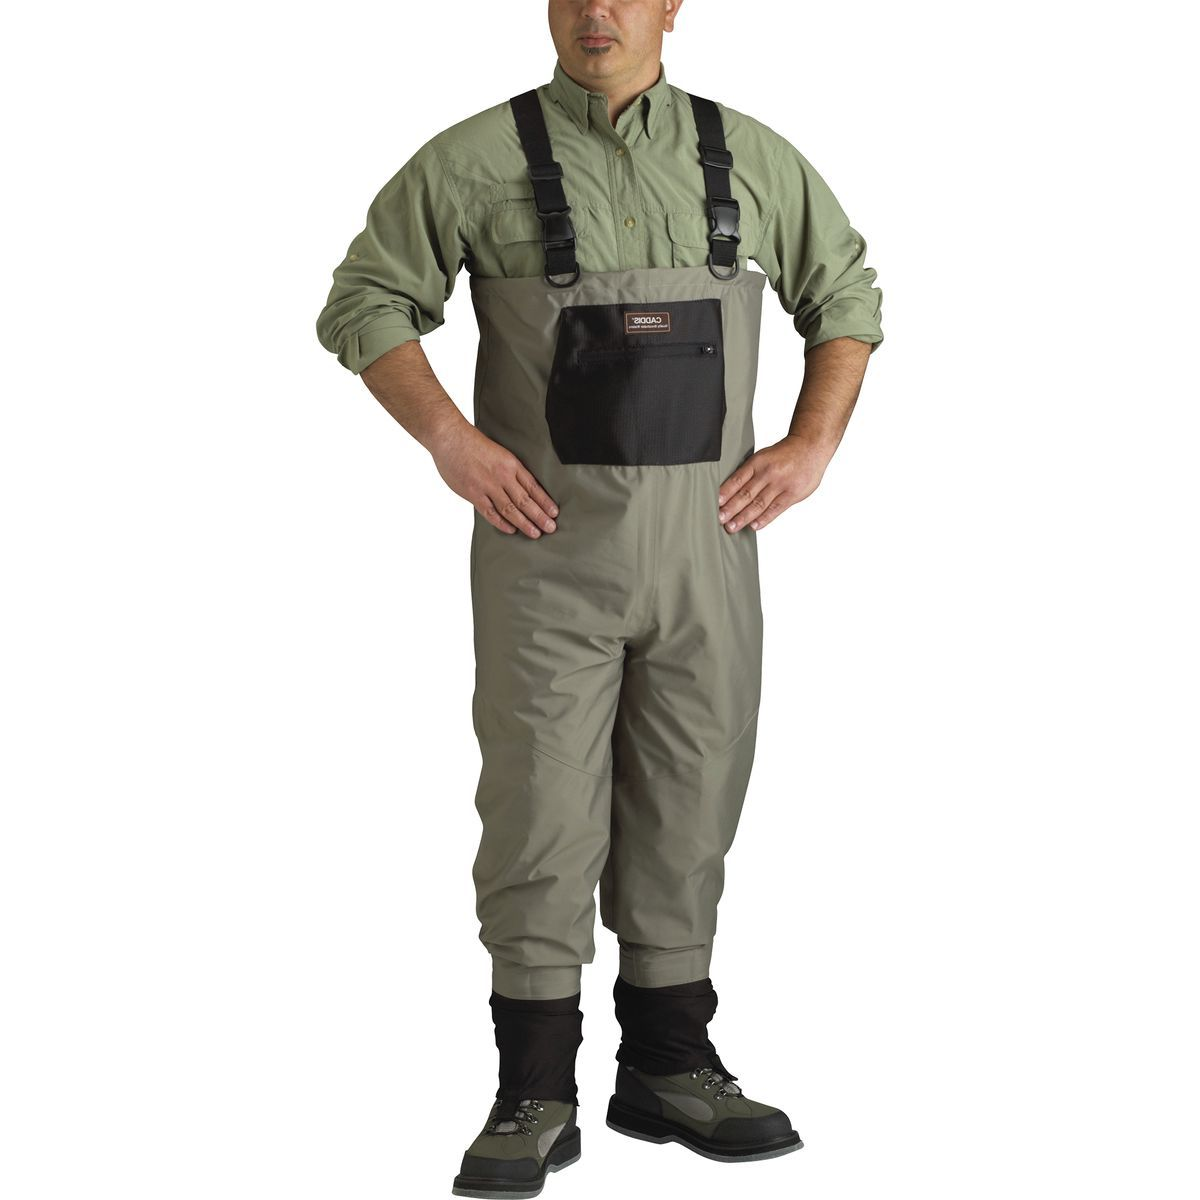 Caddis Breathable Stockingfoot Front Pocket Wader - Men's